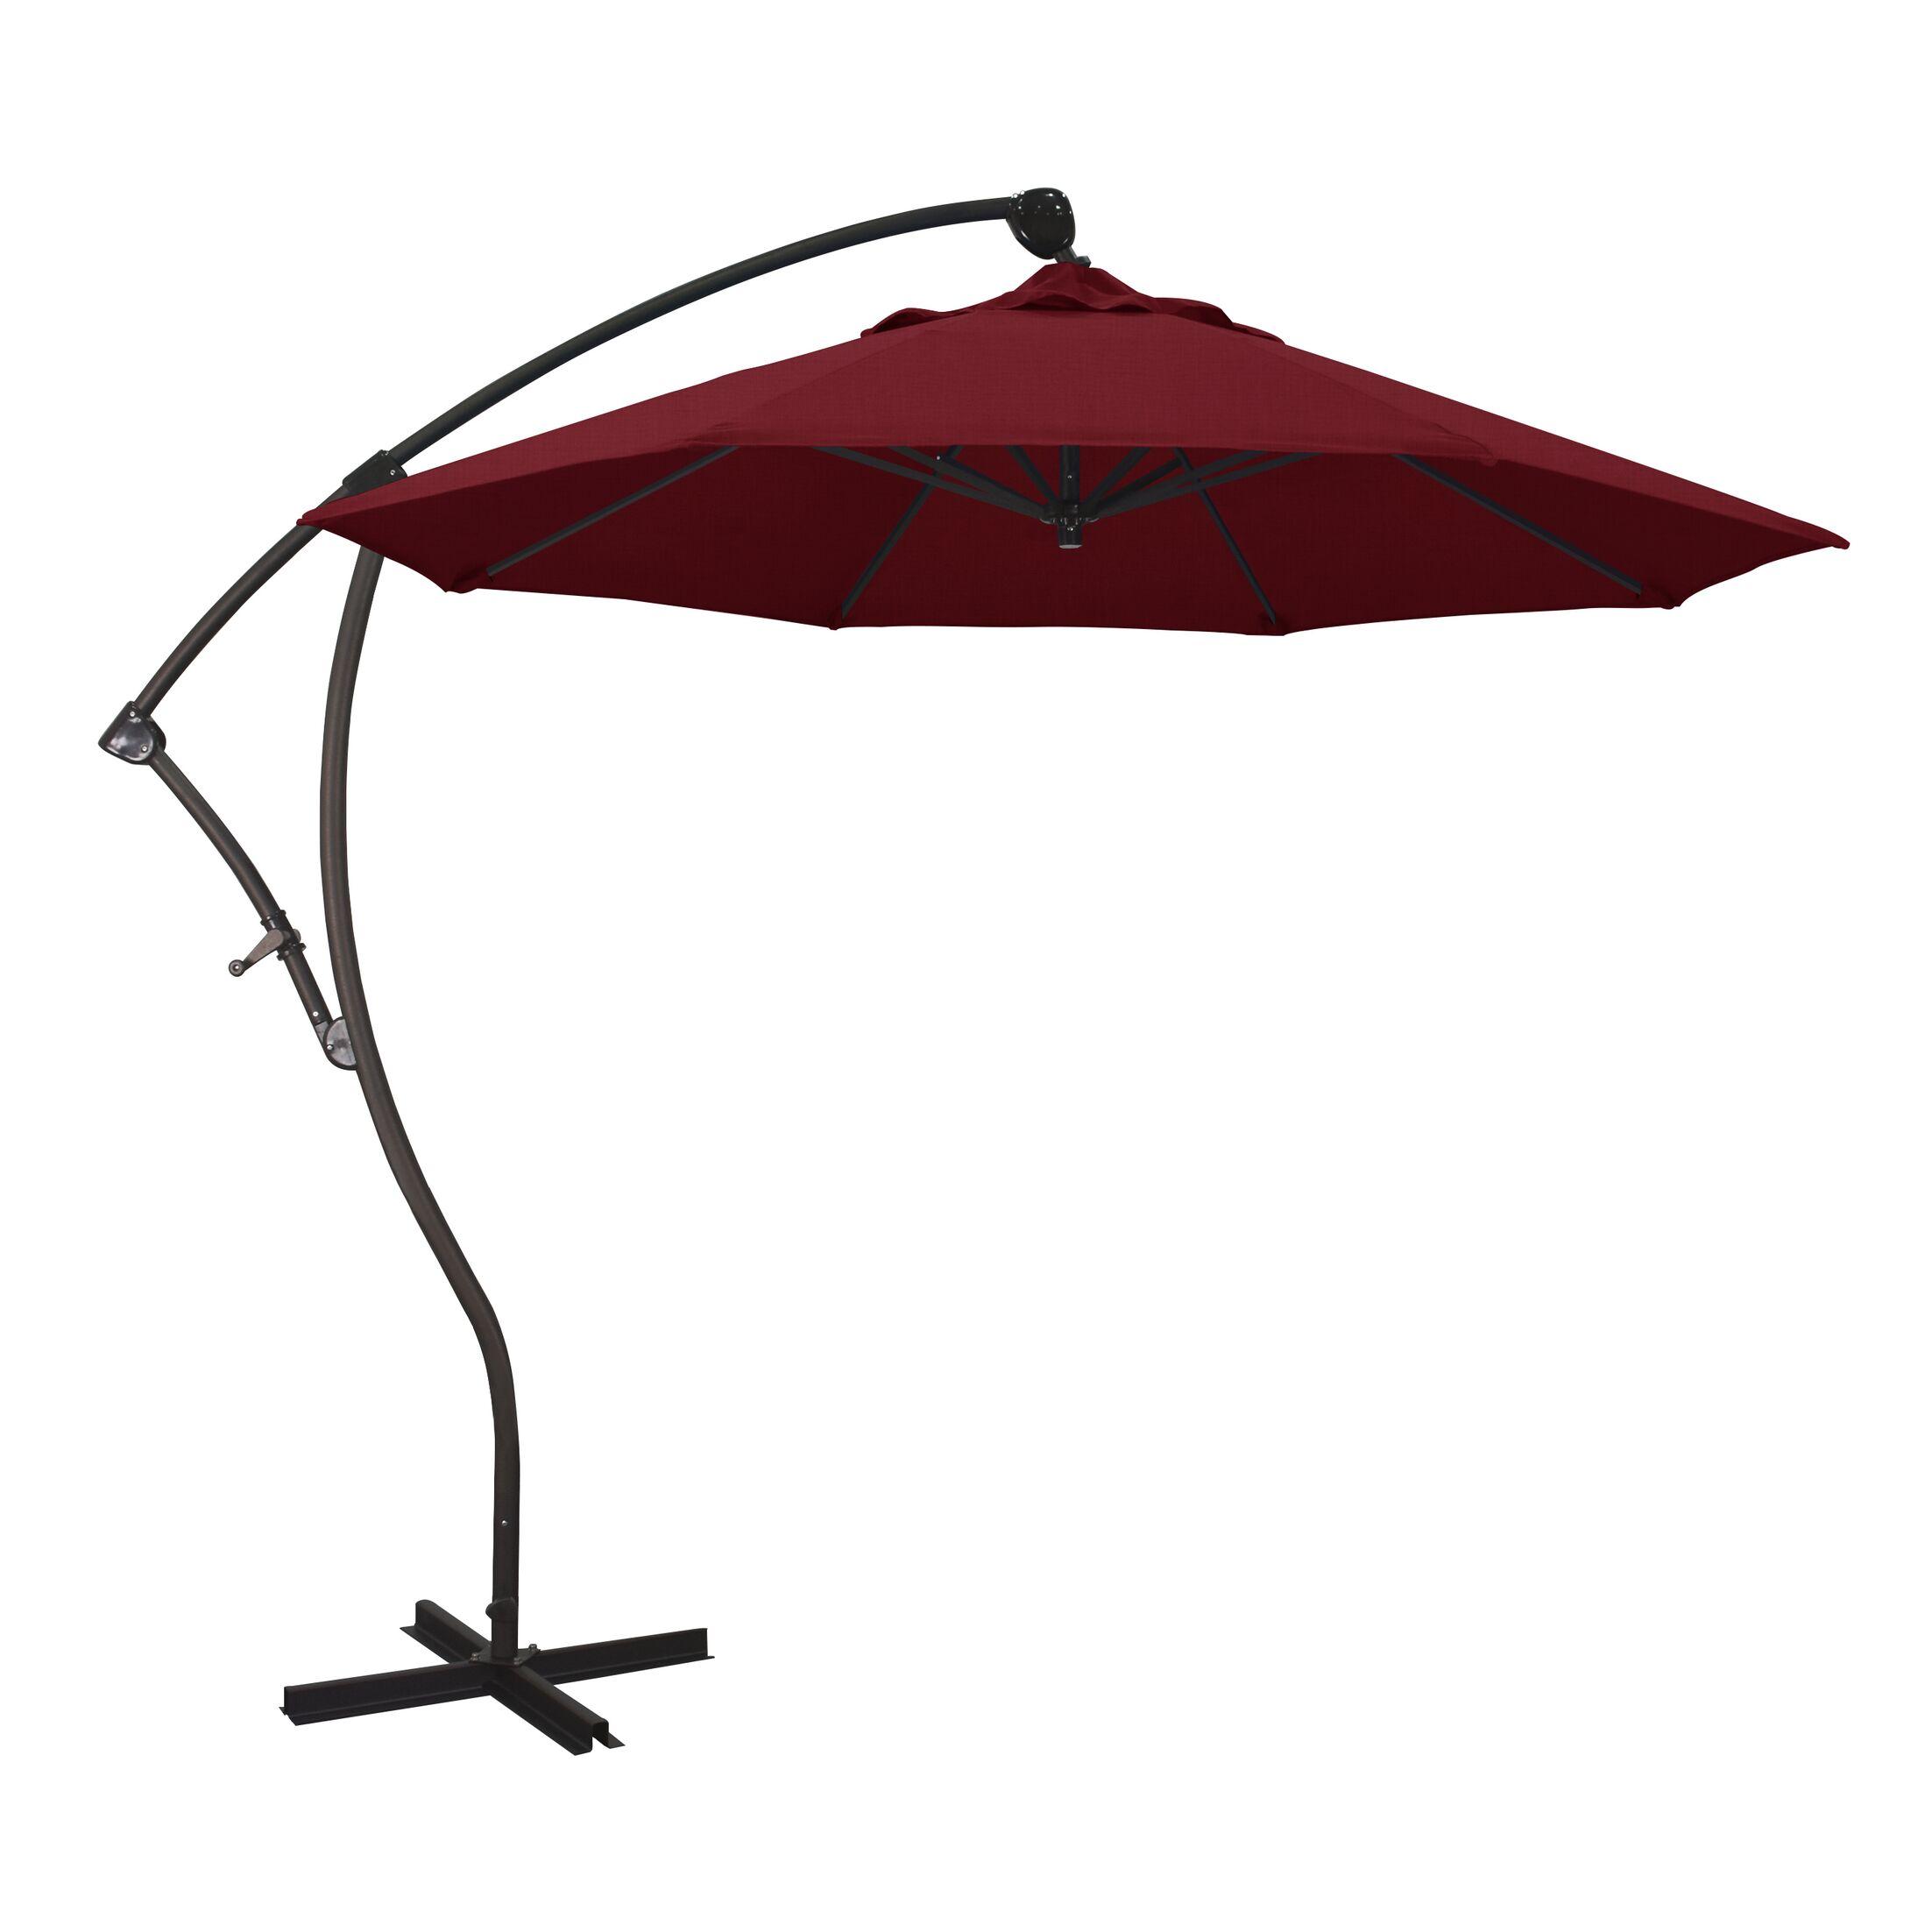 April 9' Cantilever Umbrella Fabric Color: Sunbrella A Spectrum Ruby